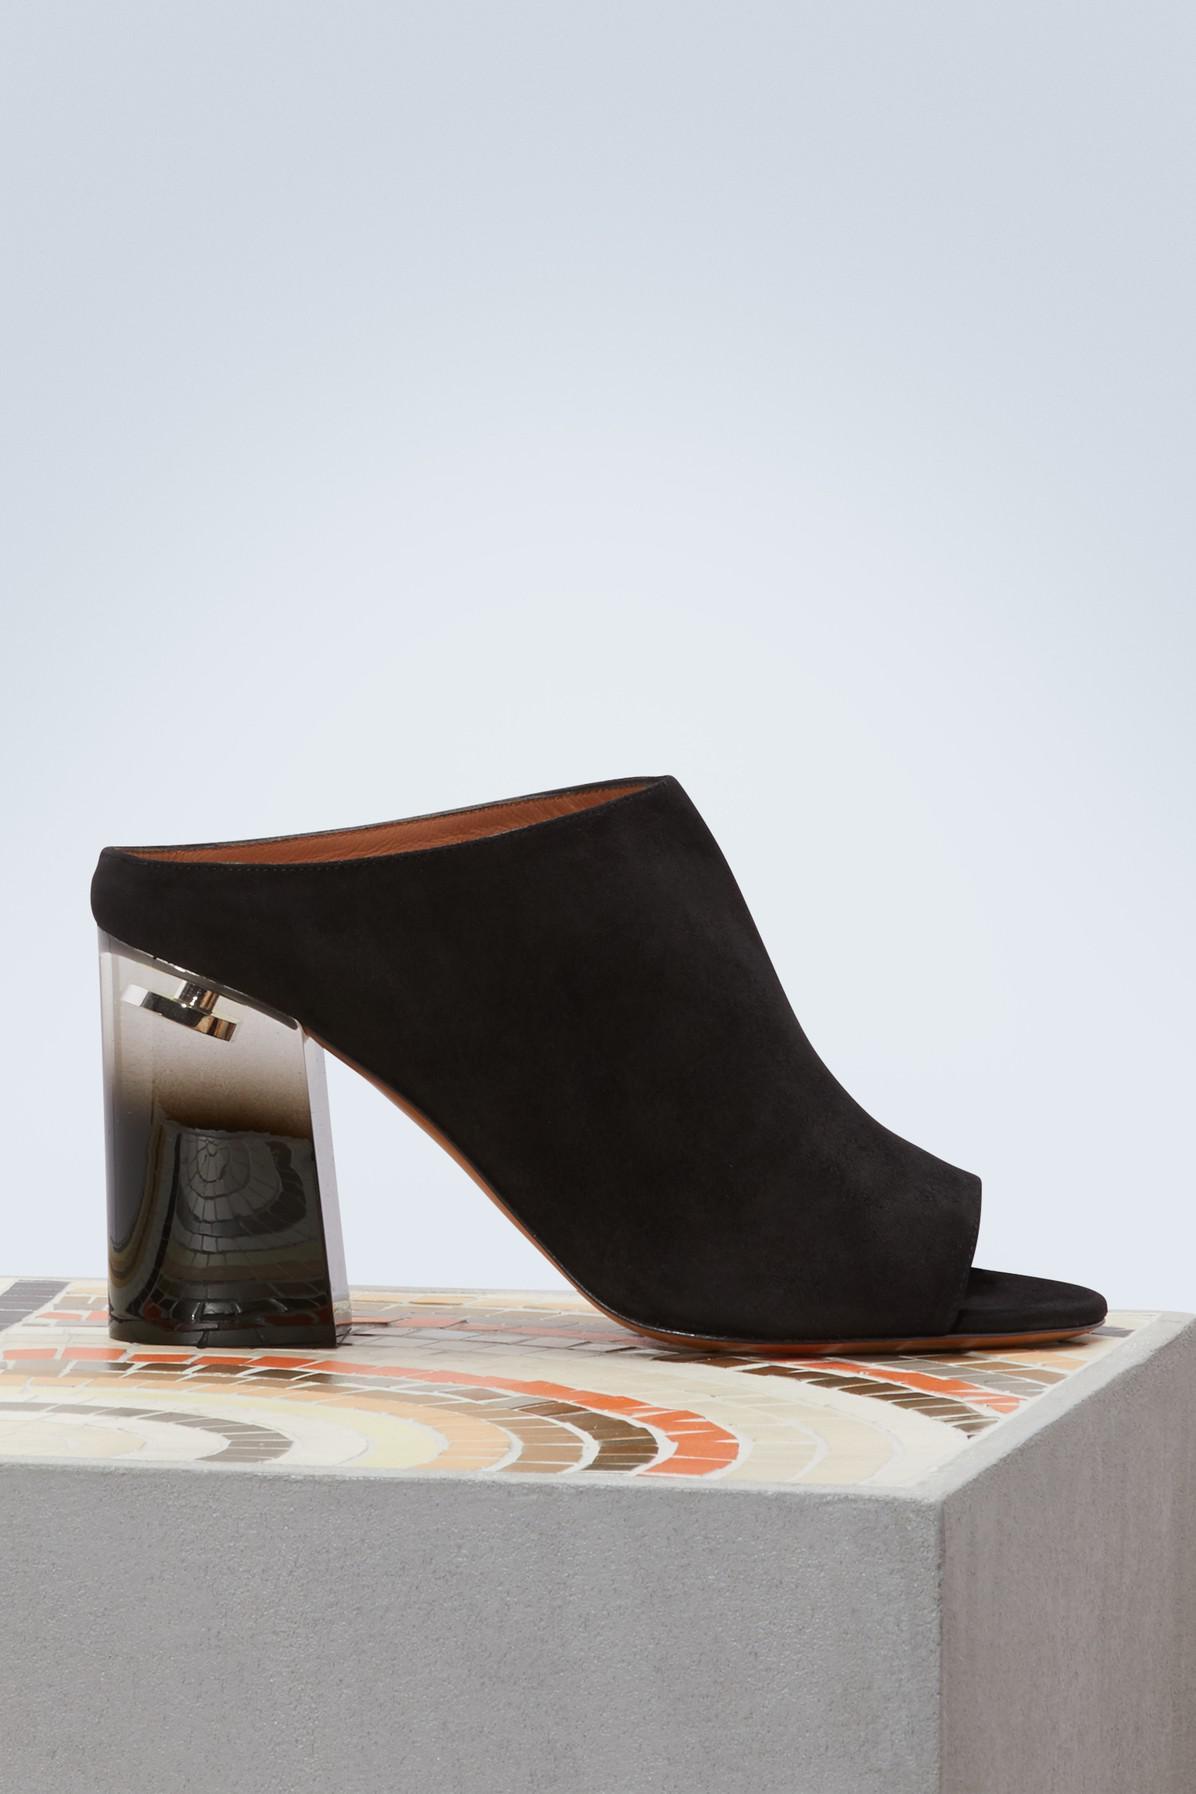 Givenchy Plexiglass-heeled slippers scnMAQLw